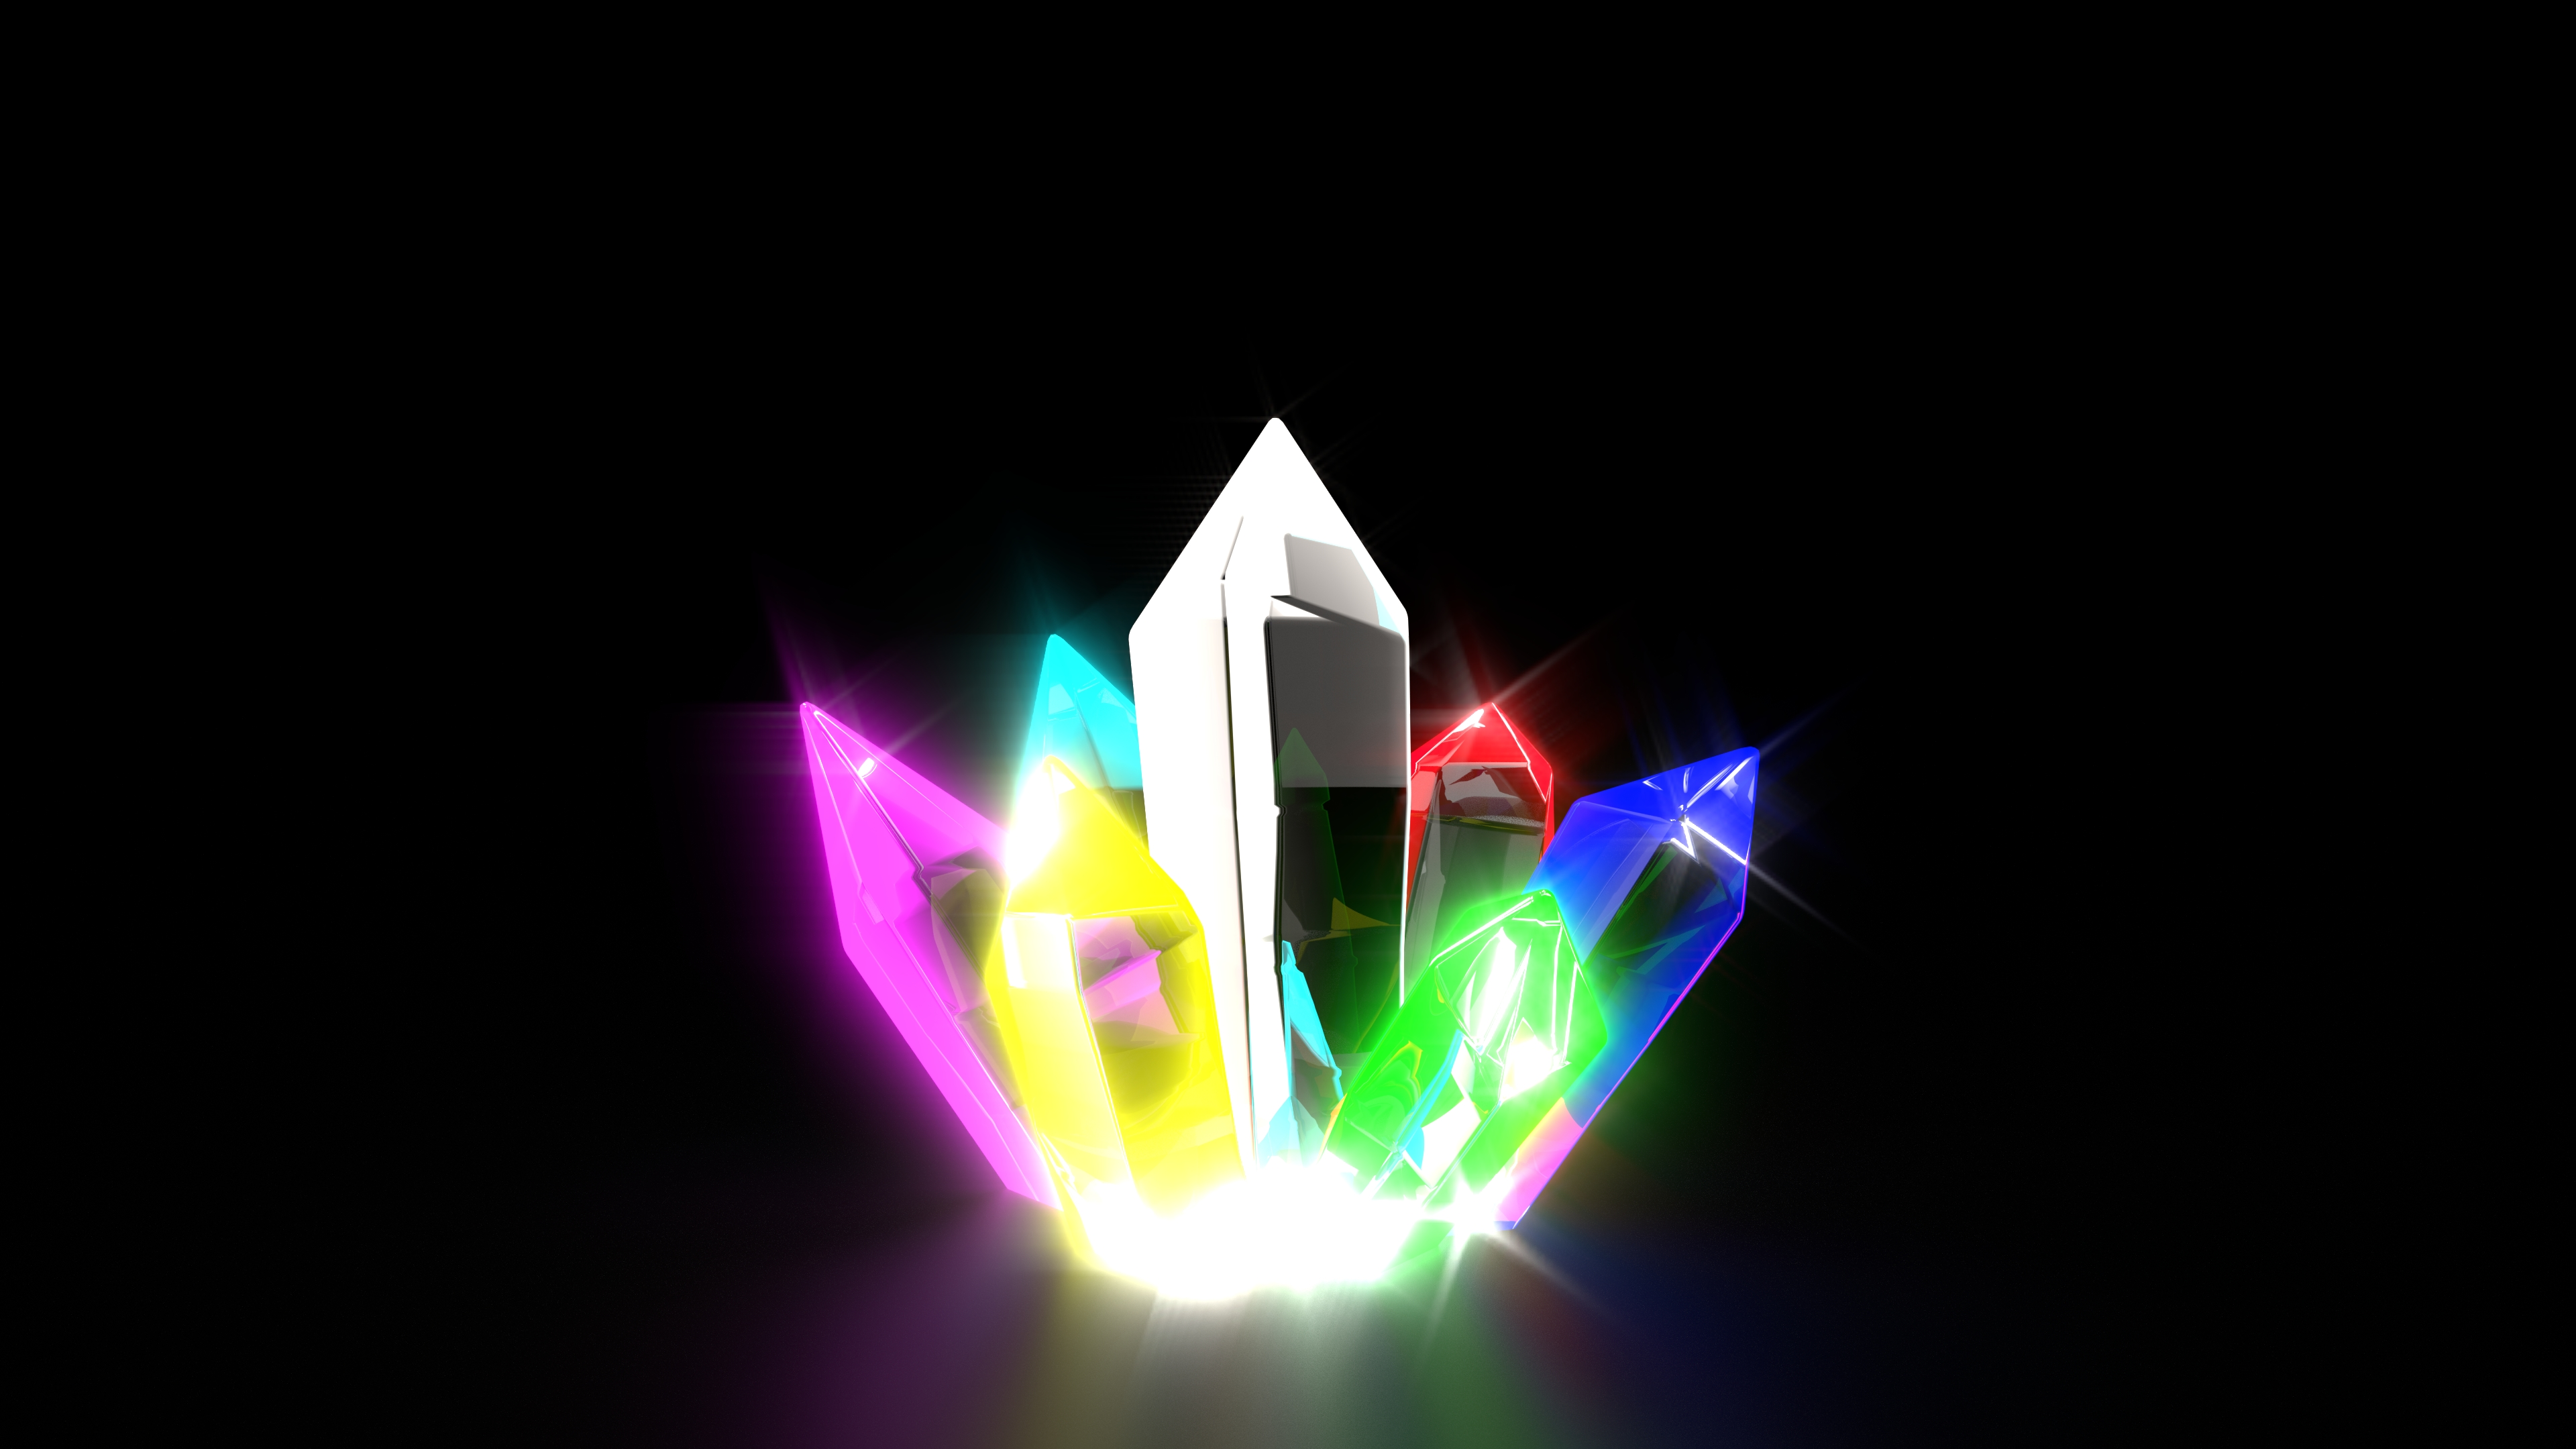 Crystal2 by abutashin